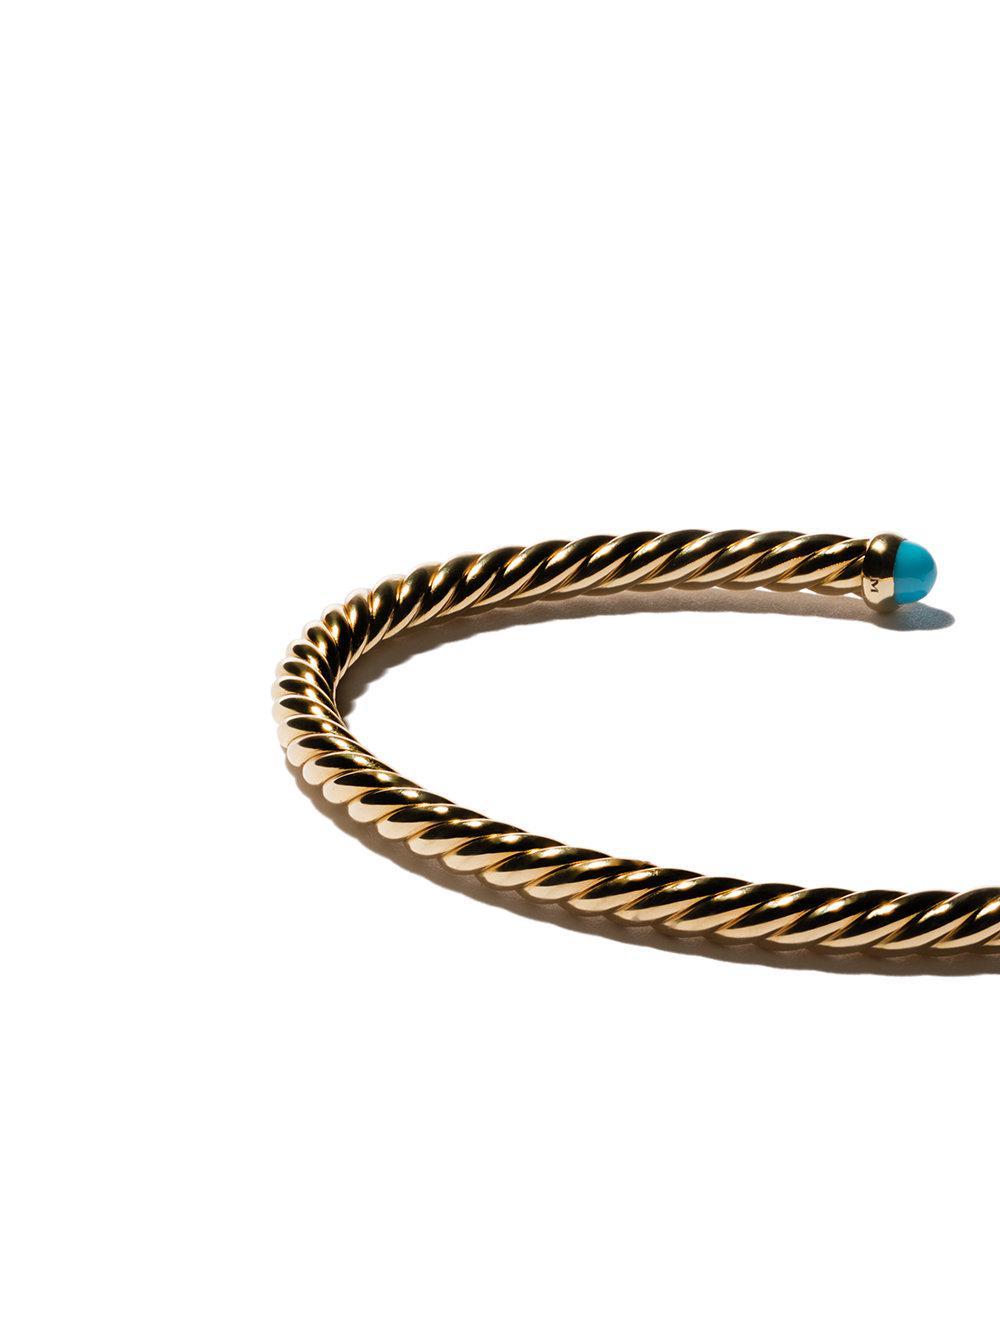 18kt yellow gold Cable Spira cuff bracelet - Metallic David Yurman AUiytbtk